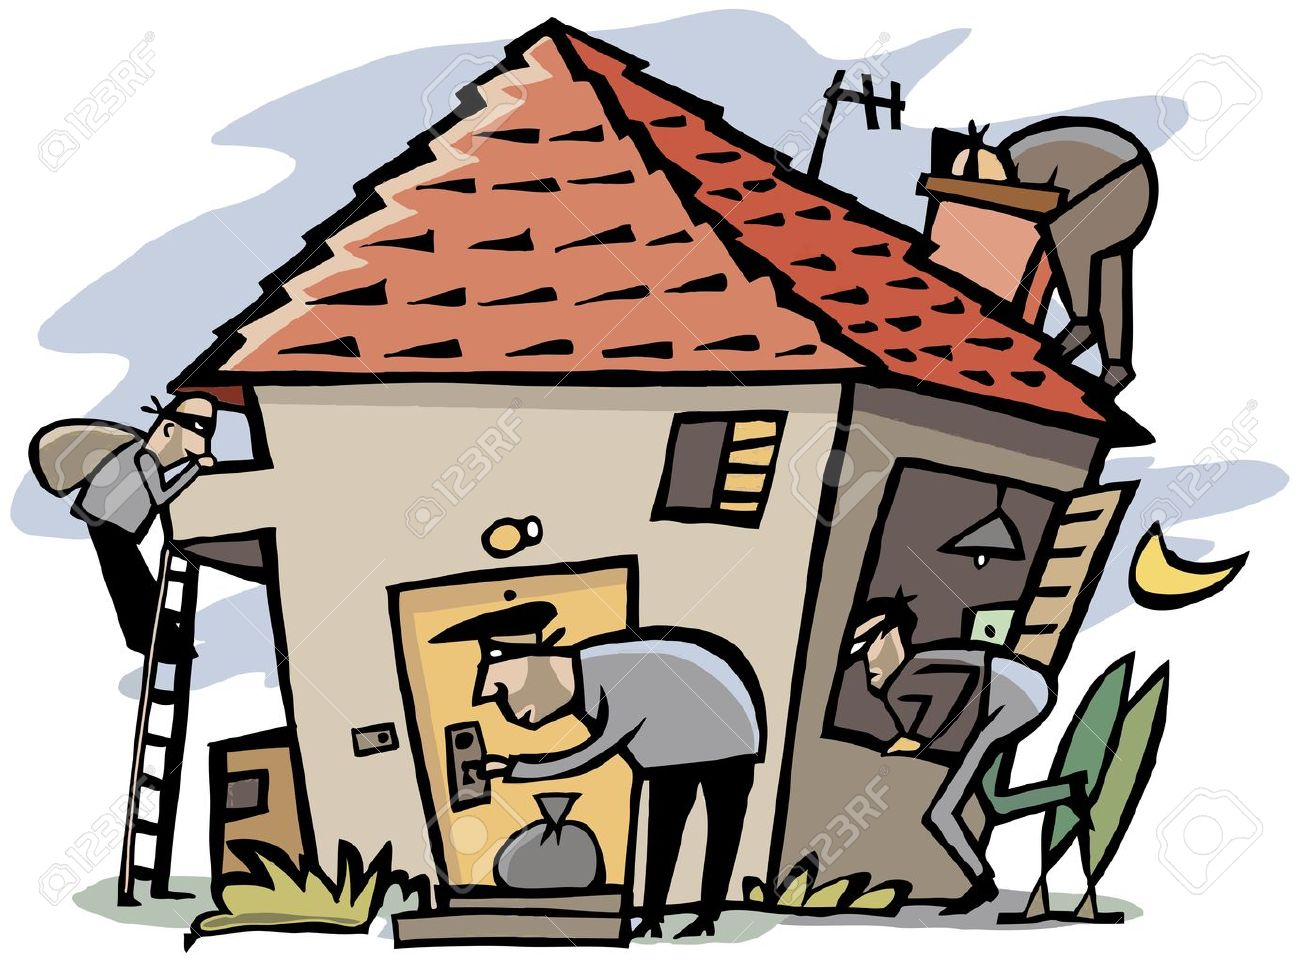 Burglar clipart in house. Cartoon robber free download